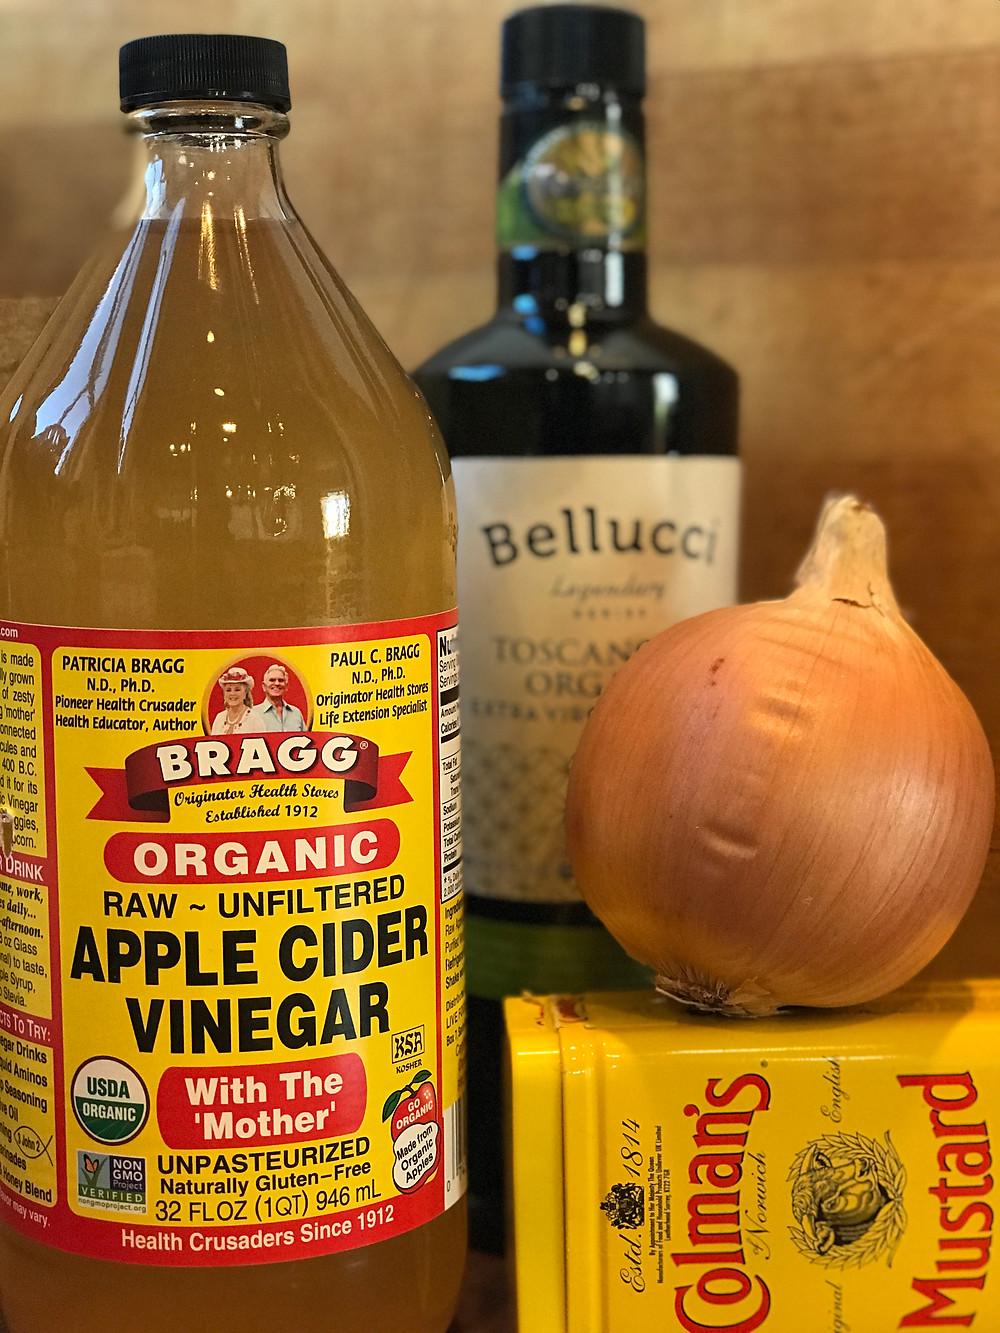 apple cider vinegar, onion, powered mustard, olive oil